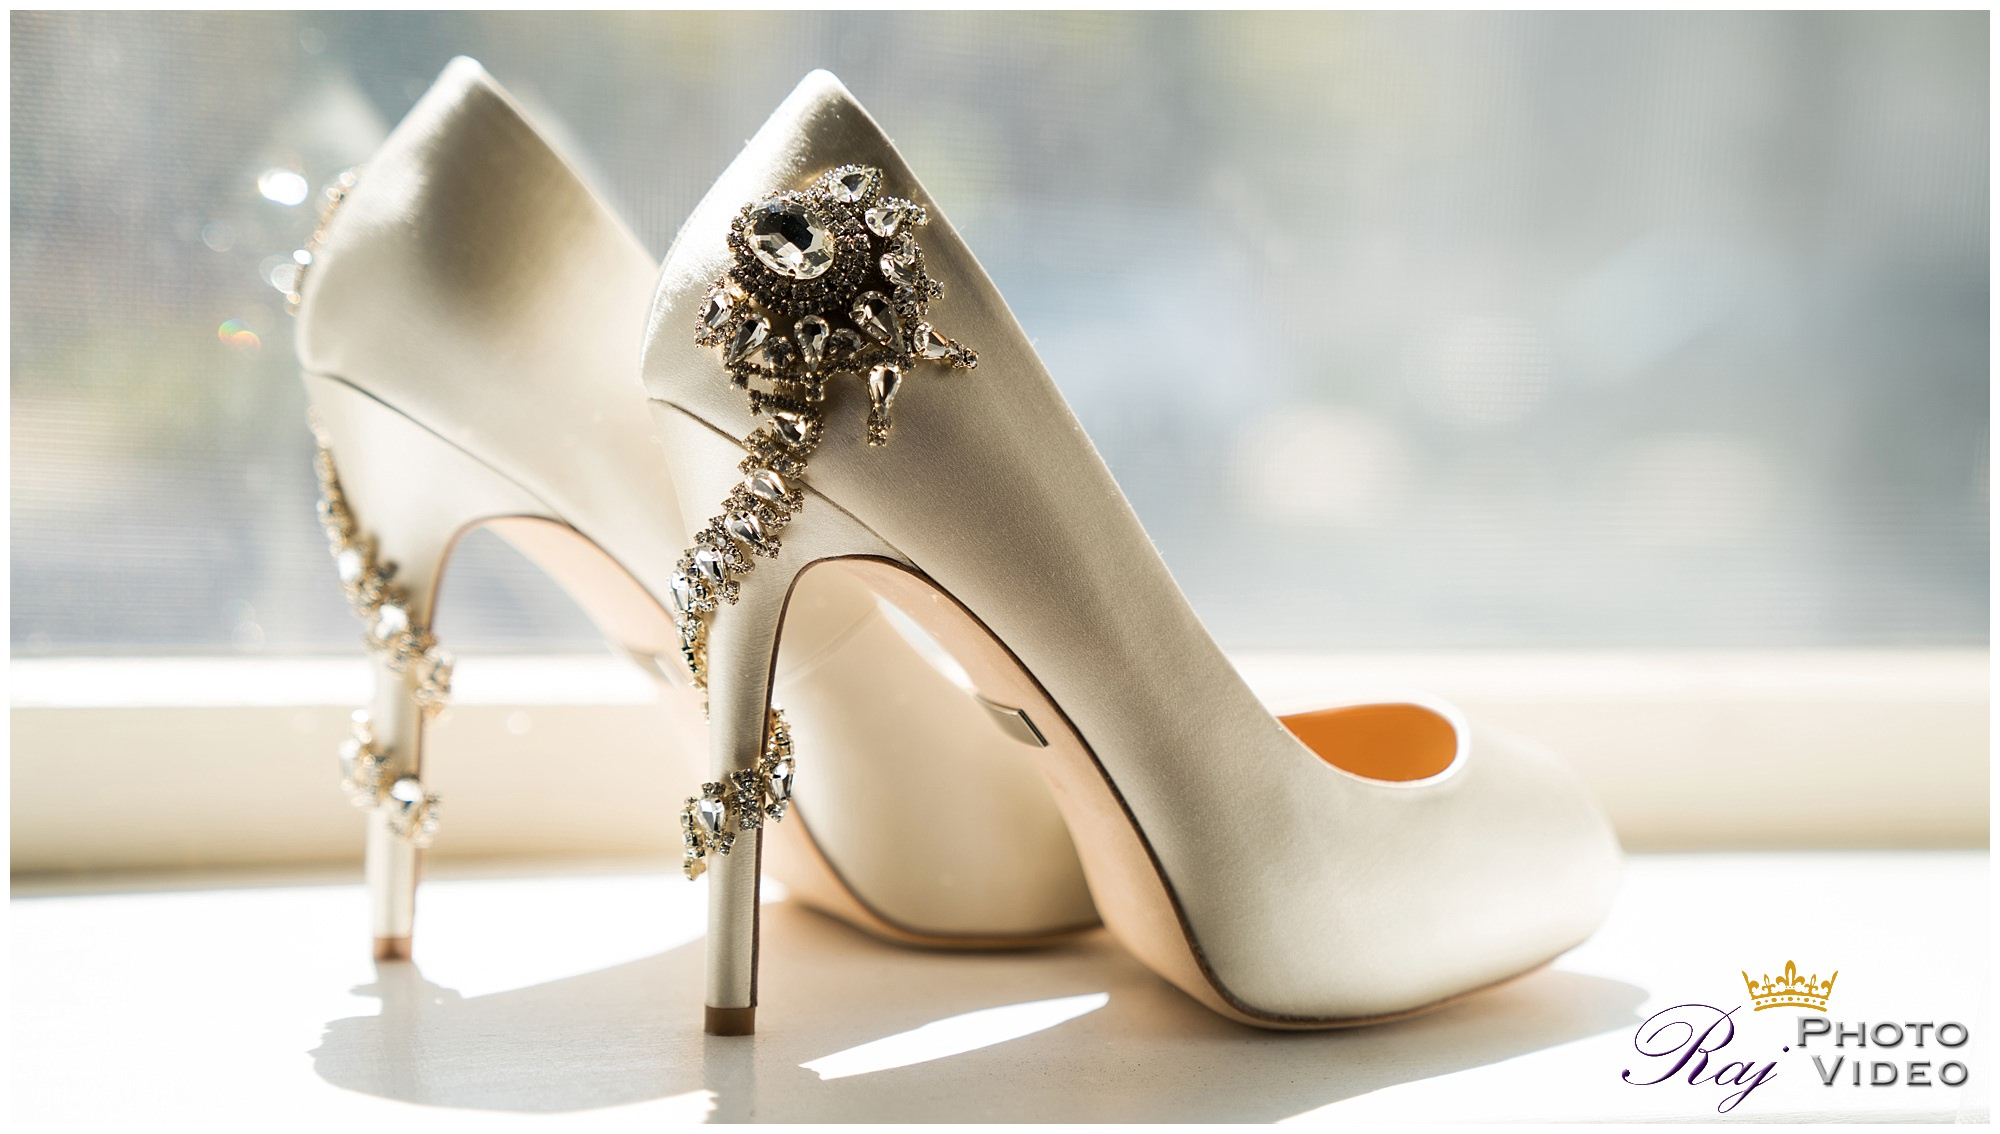 The-Armory-Perth-Amboy-NJ-Catholic-Wedding-Yudelkis-Stephen-3.jpg